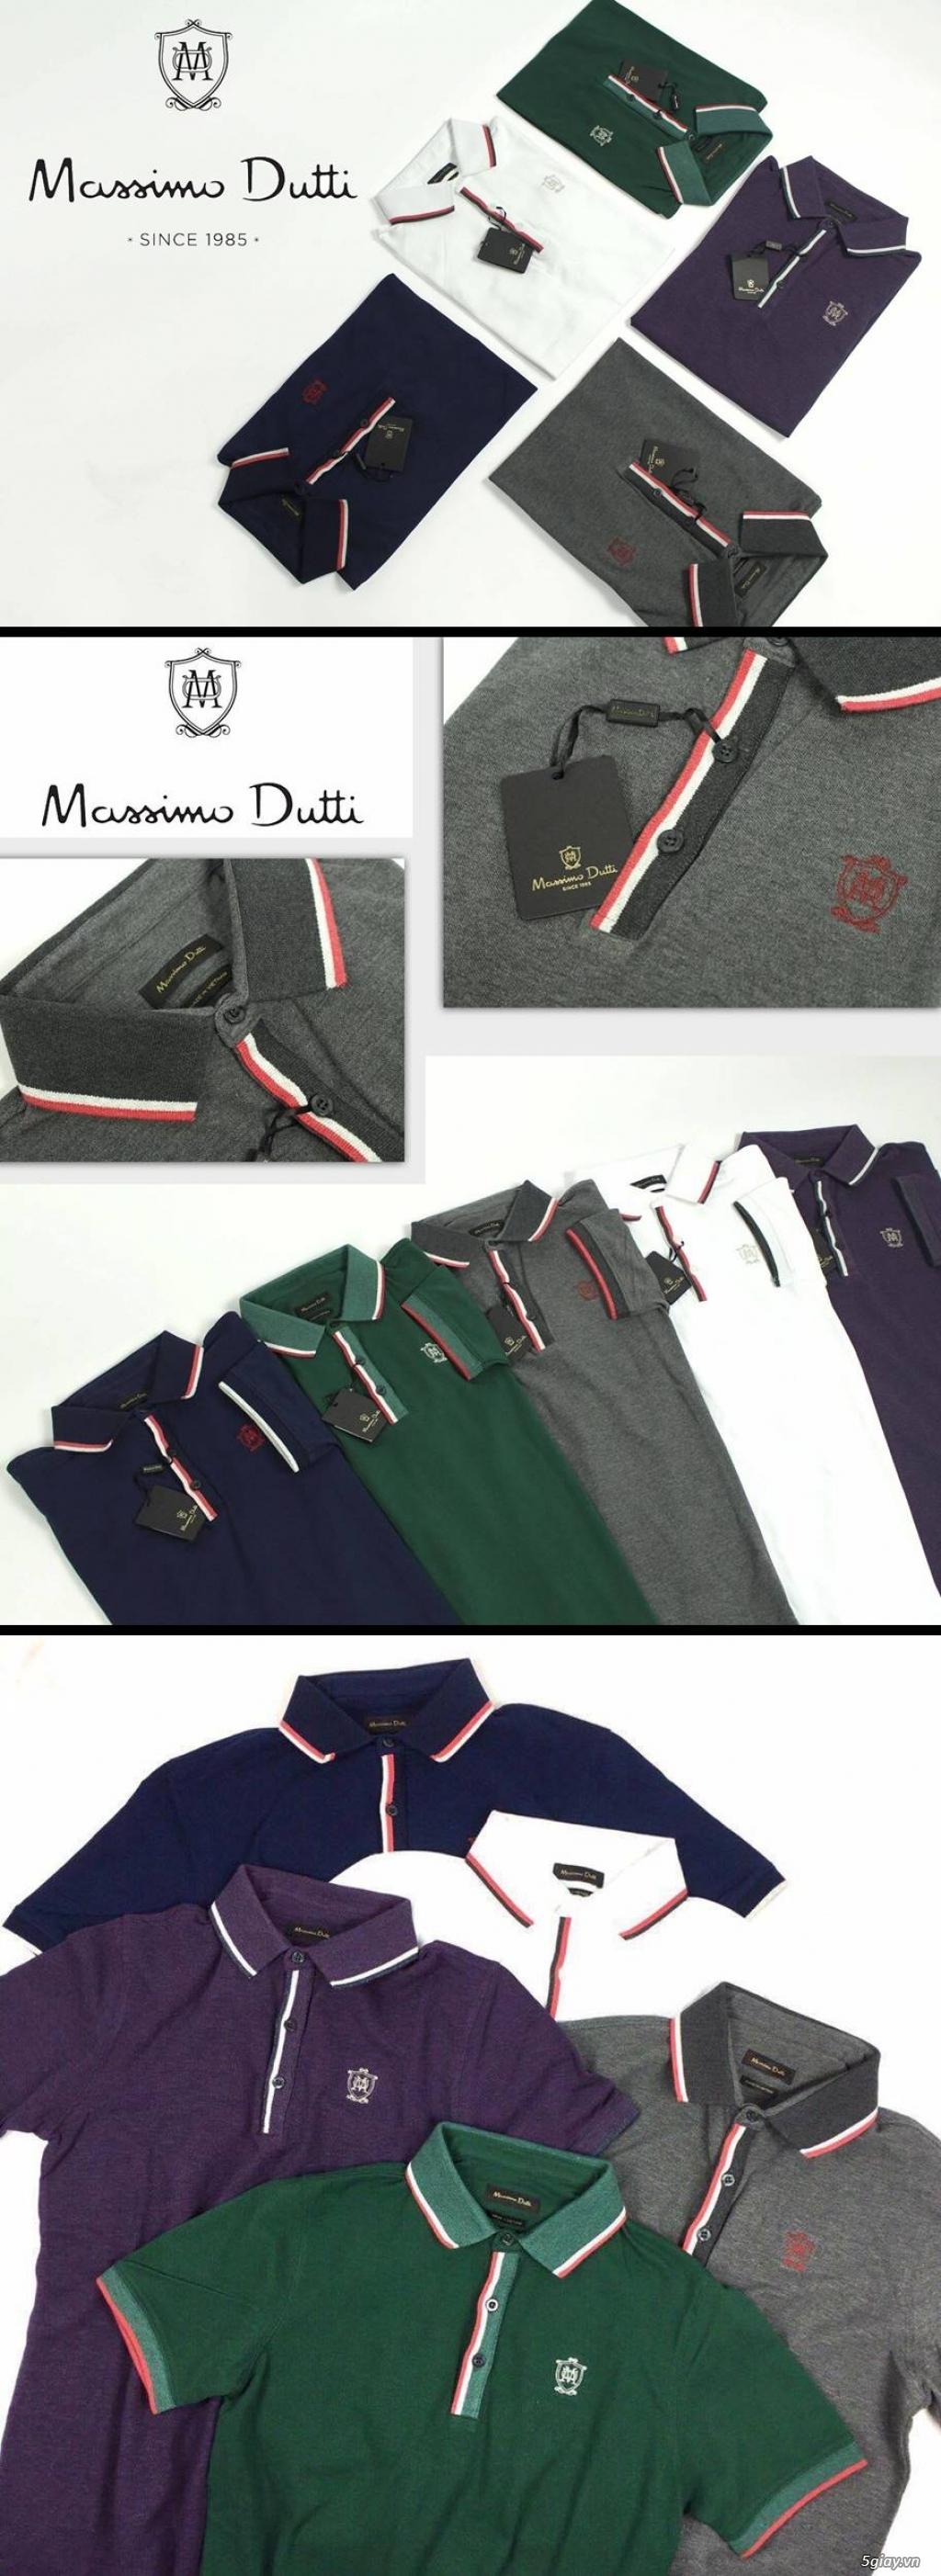 Áo thun Hollister VNXK,áo thun SuperDry VNXK ,áo A&F VNXK ,áo thun cổ tim thun láng - 33